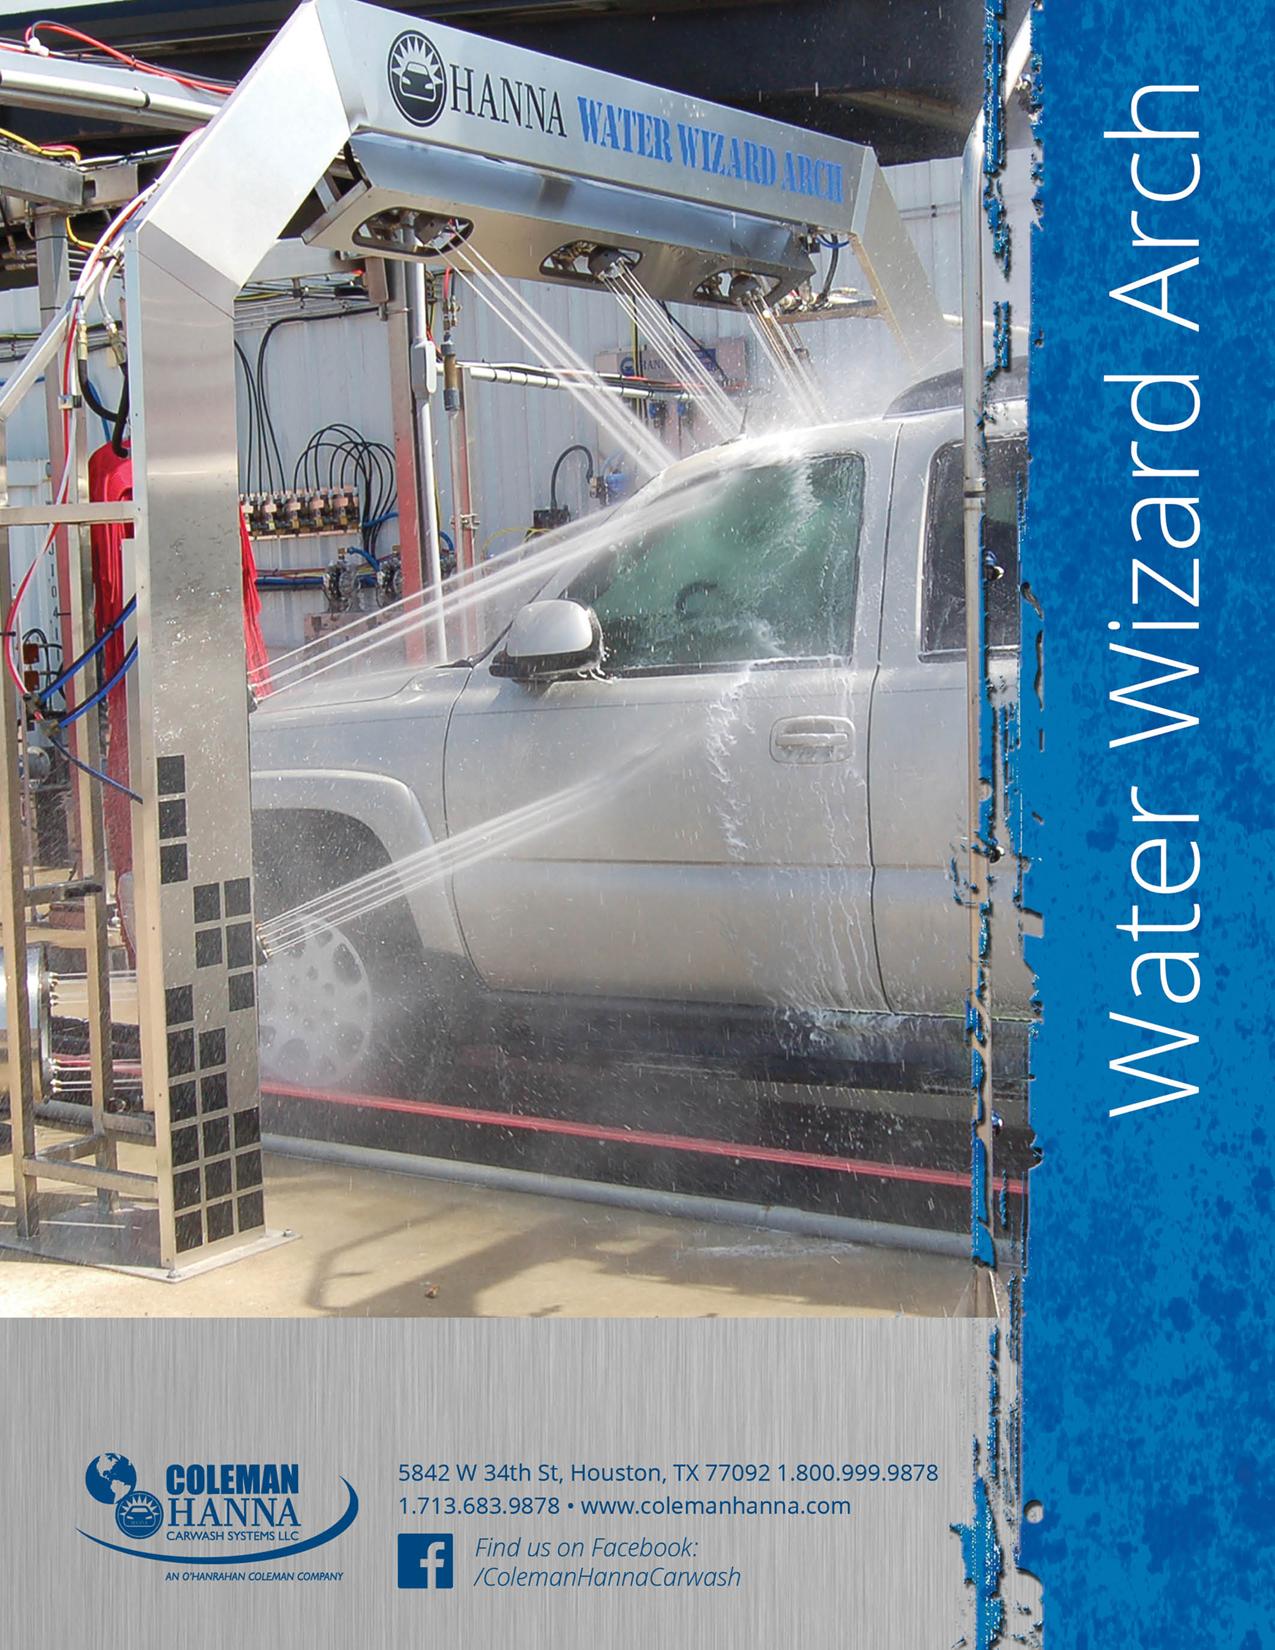 WaterWizardArch